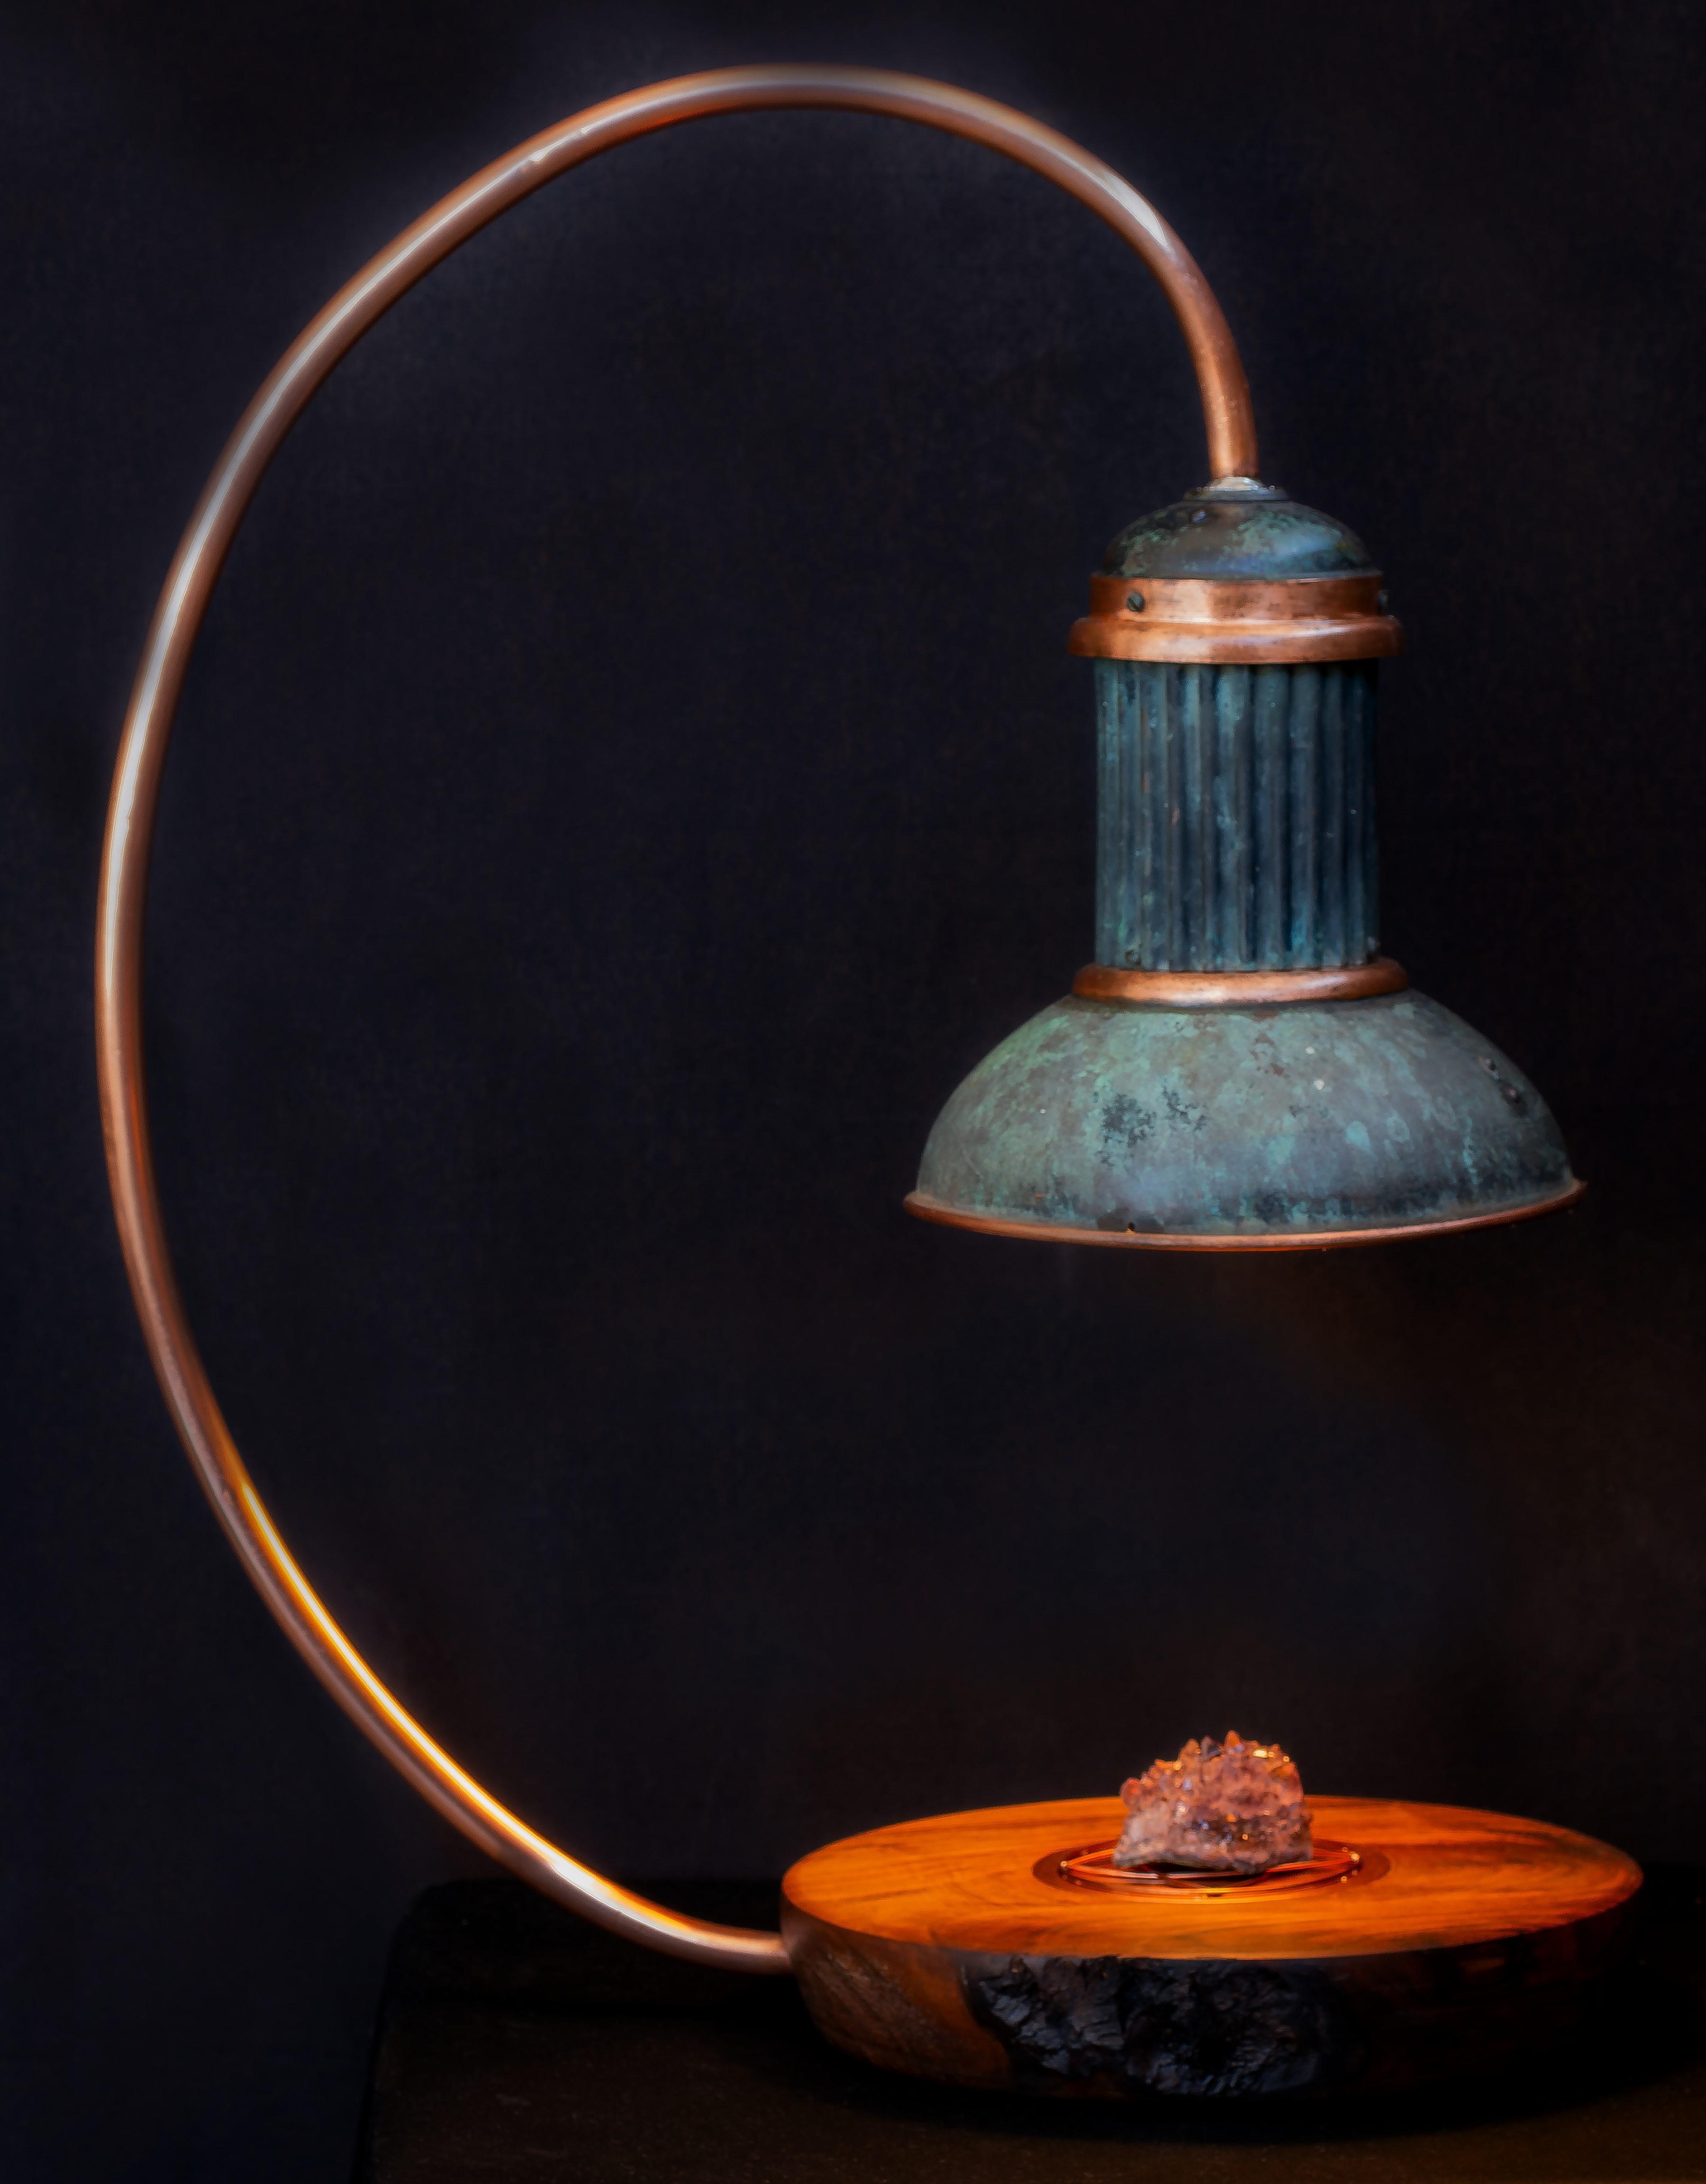 Lampe design, lampe originale, lampe cuivre